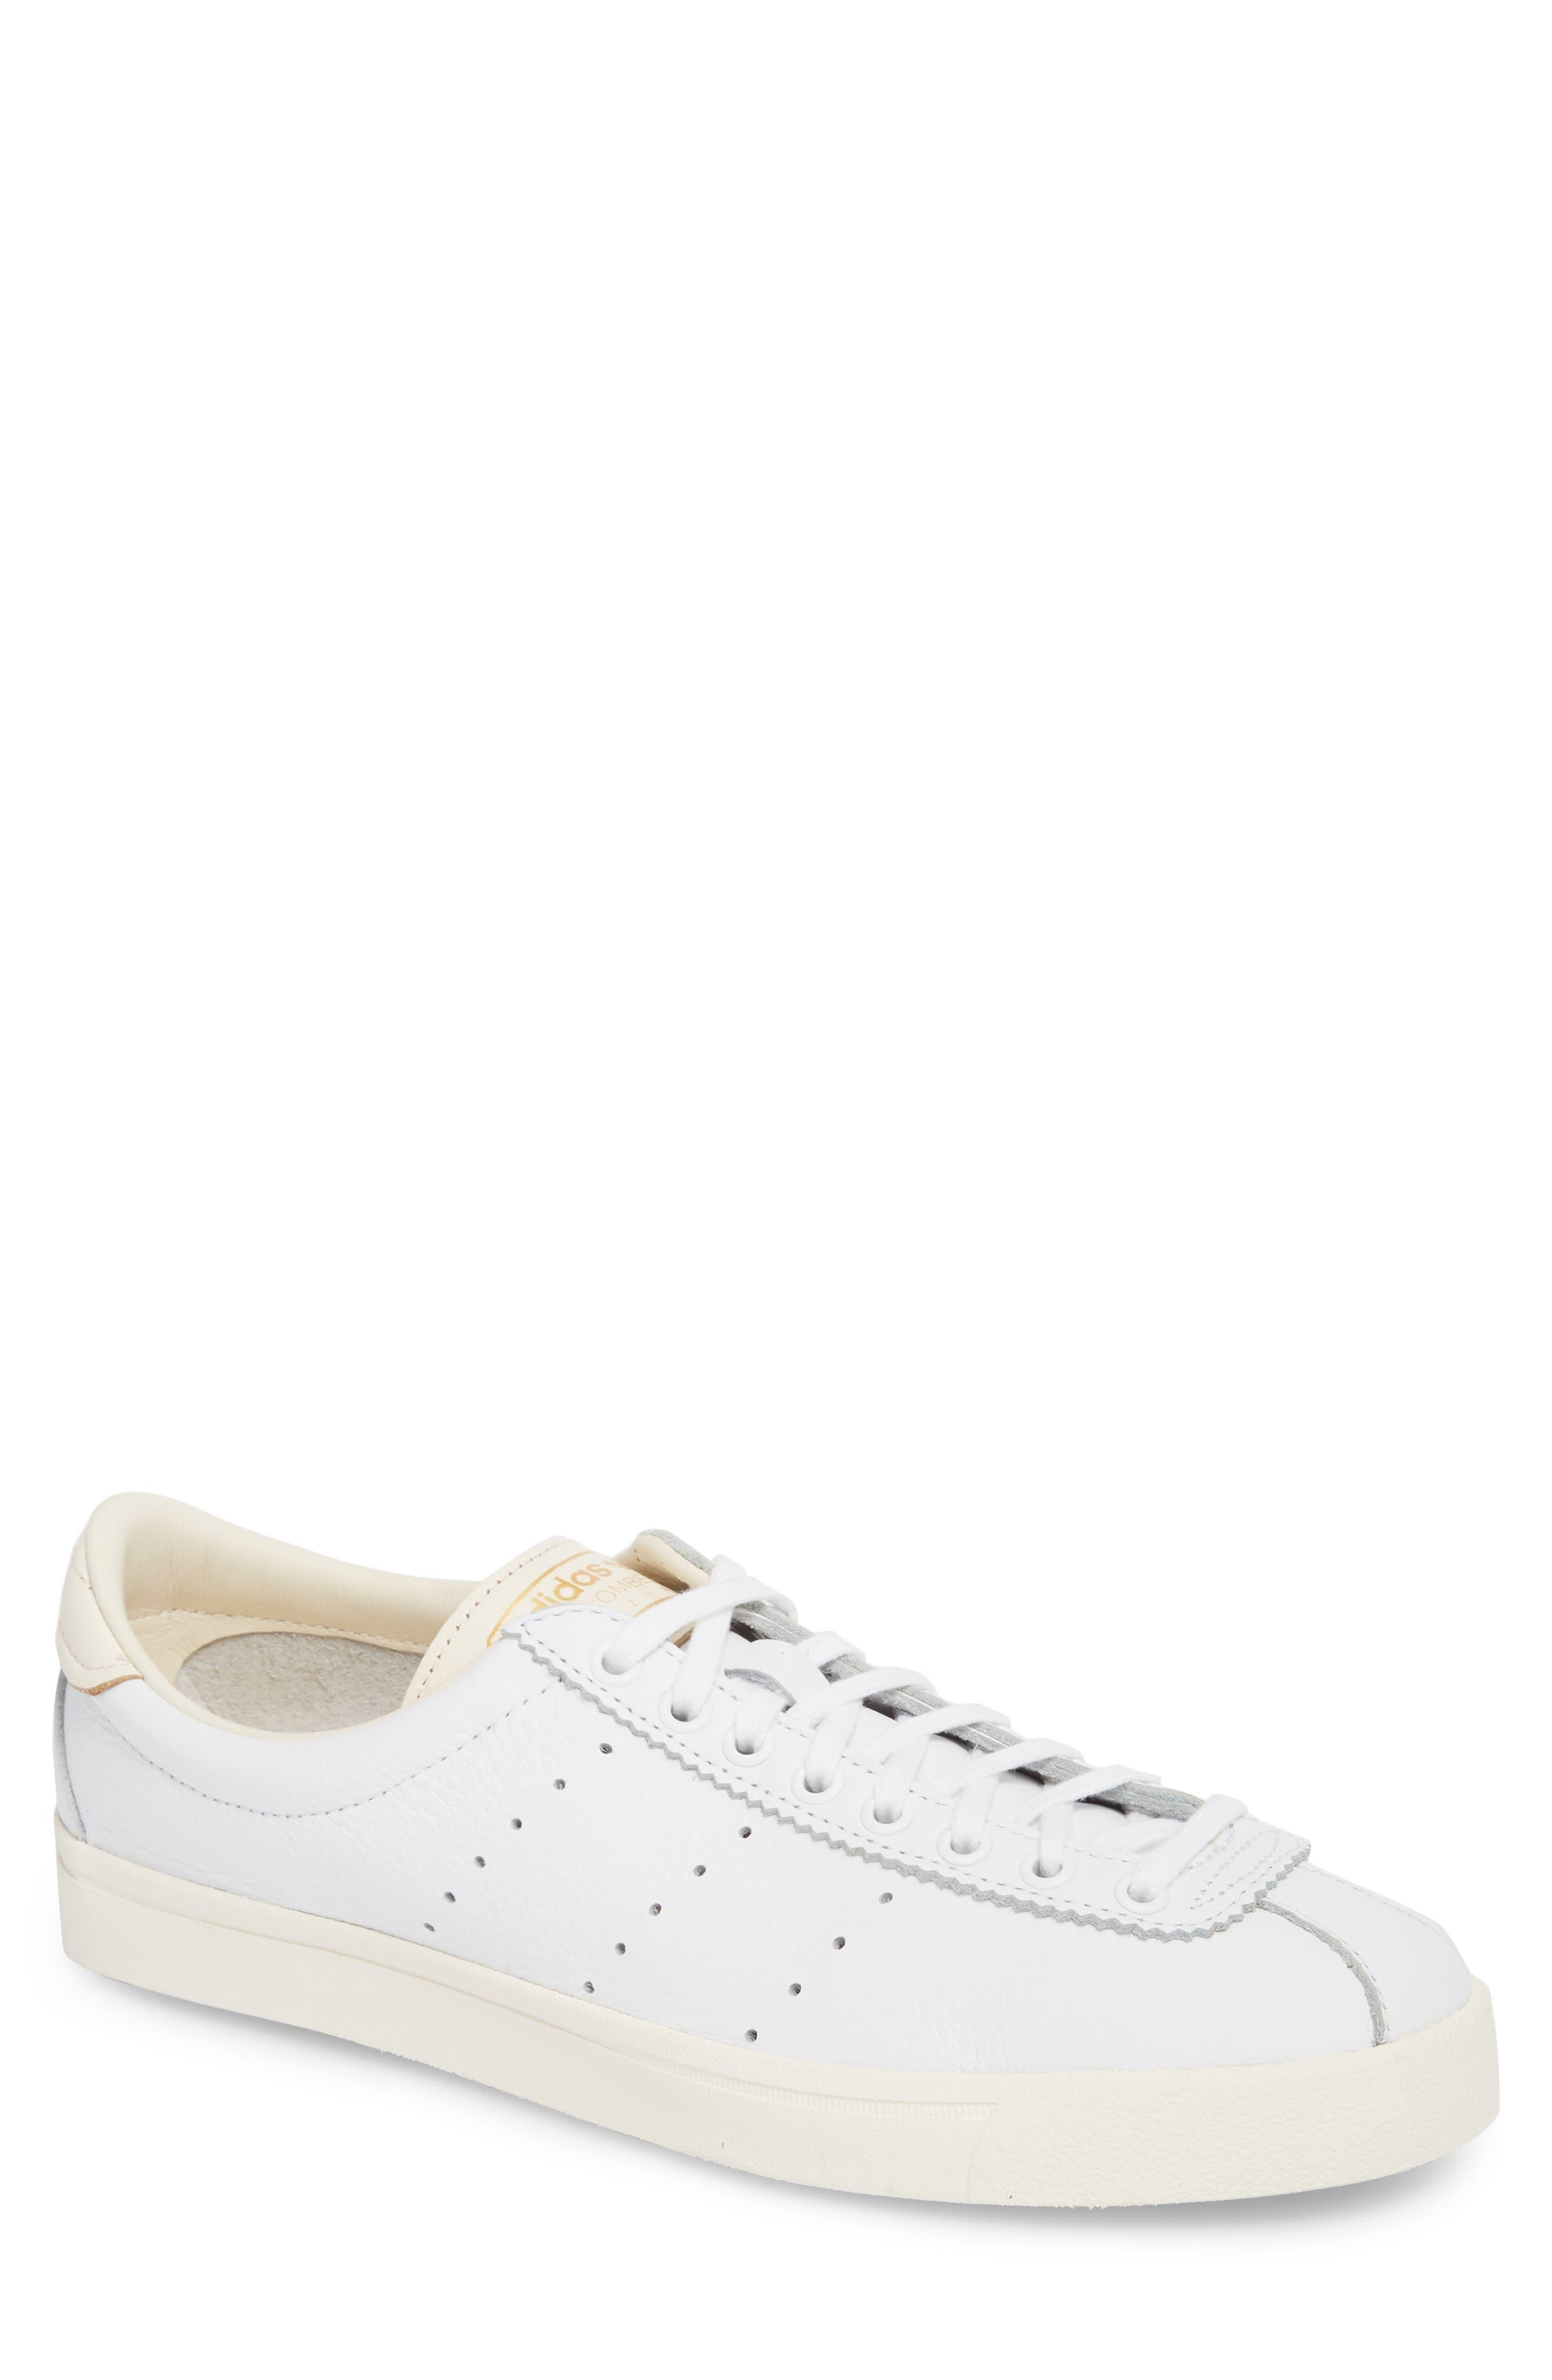 adidas Lacombe SPZL Sneaker (Men)